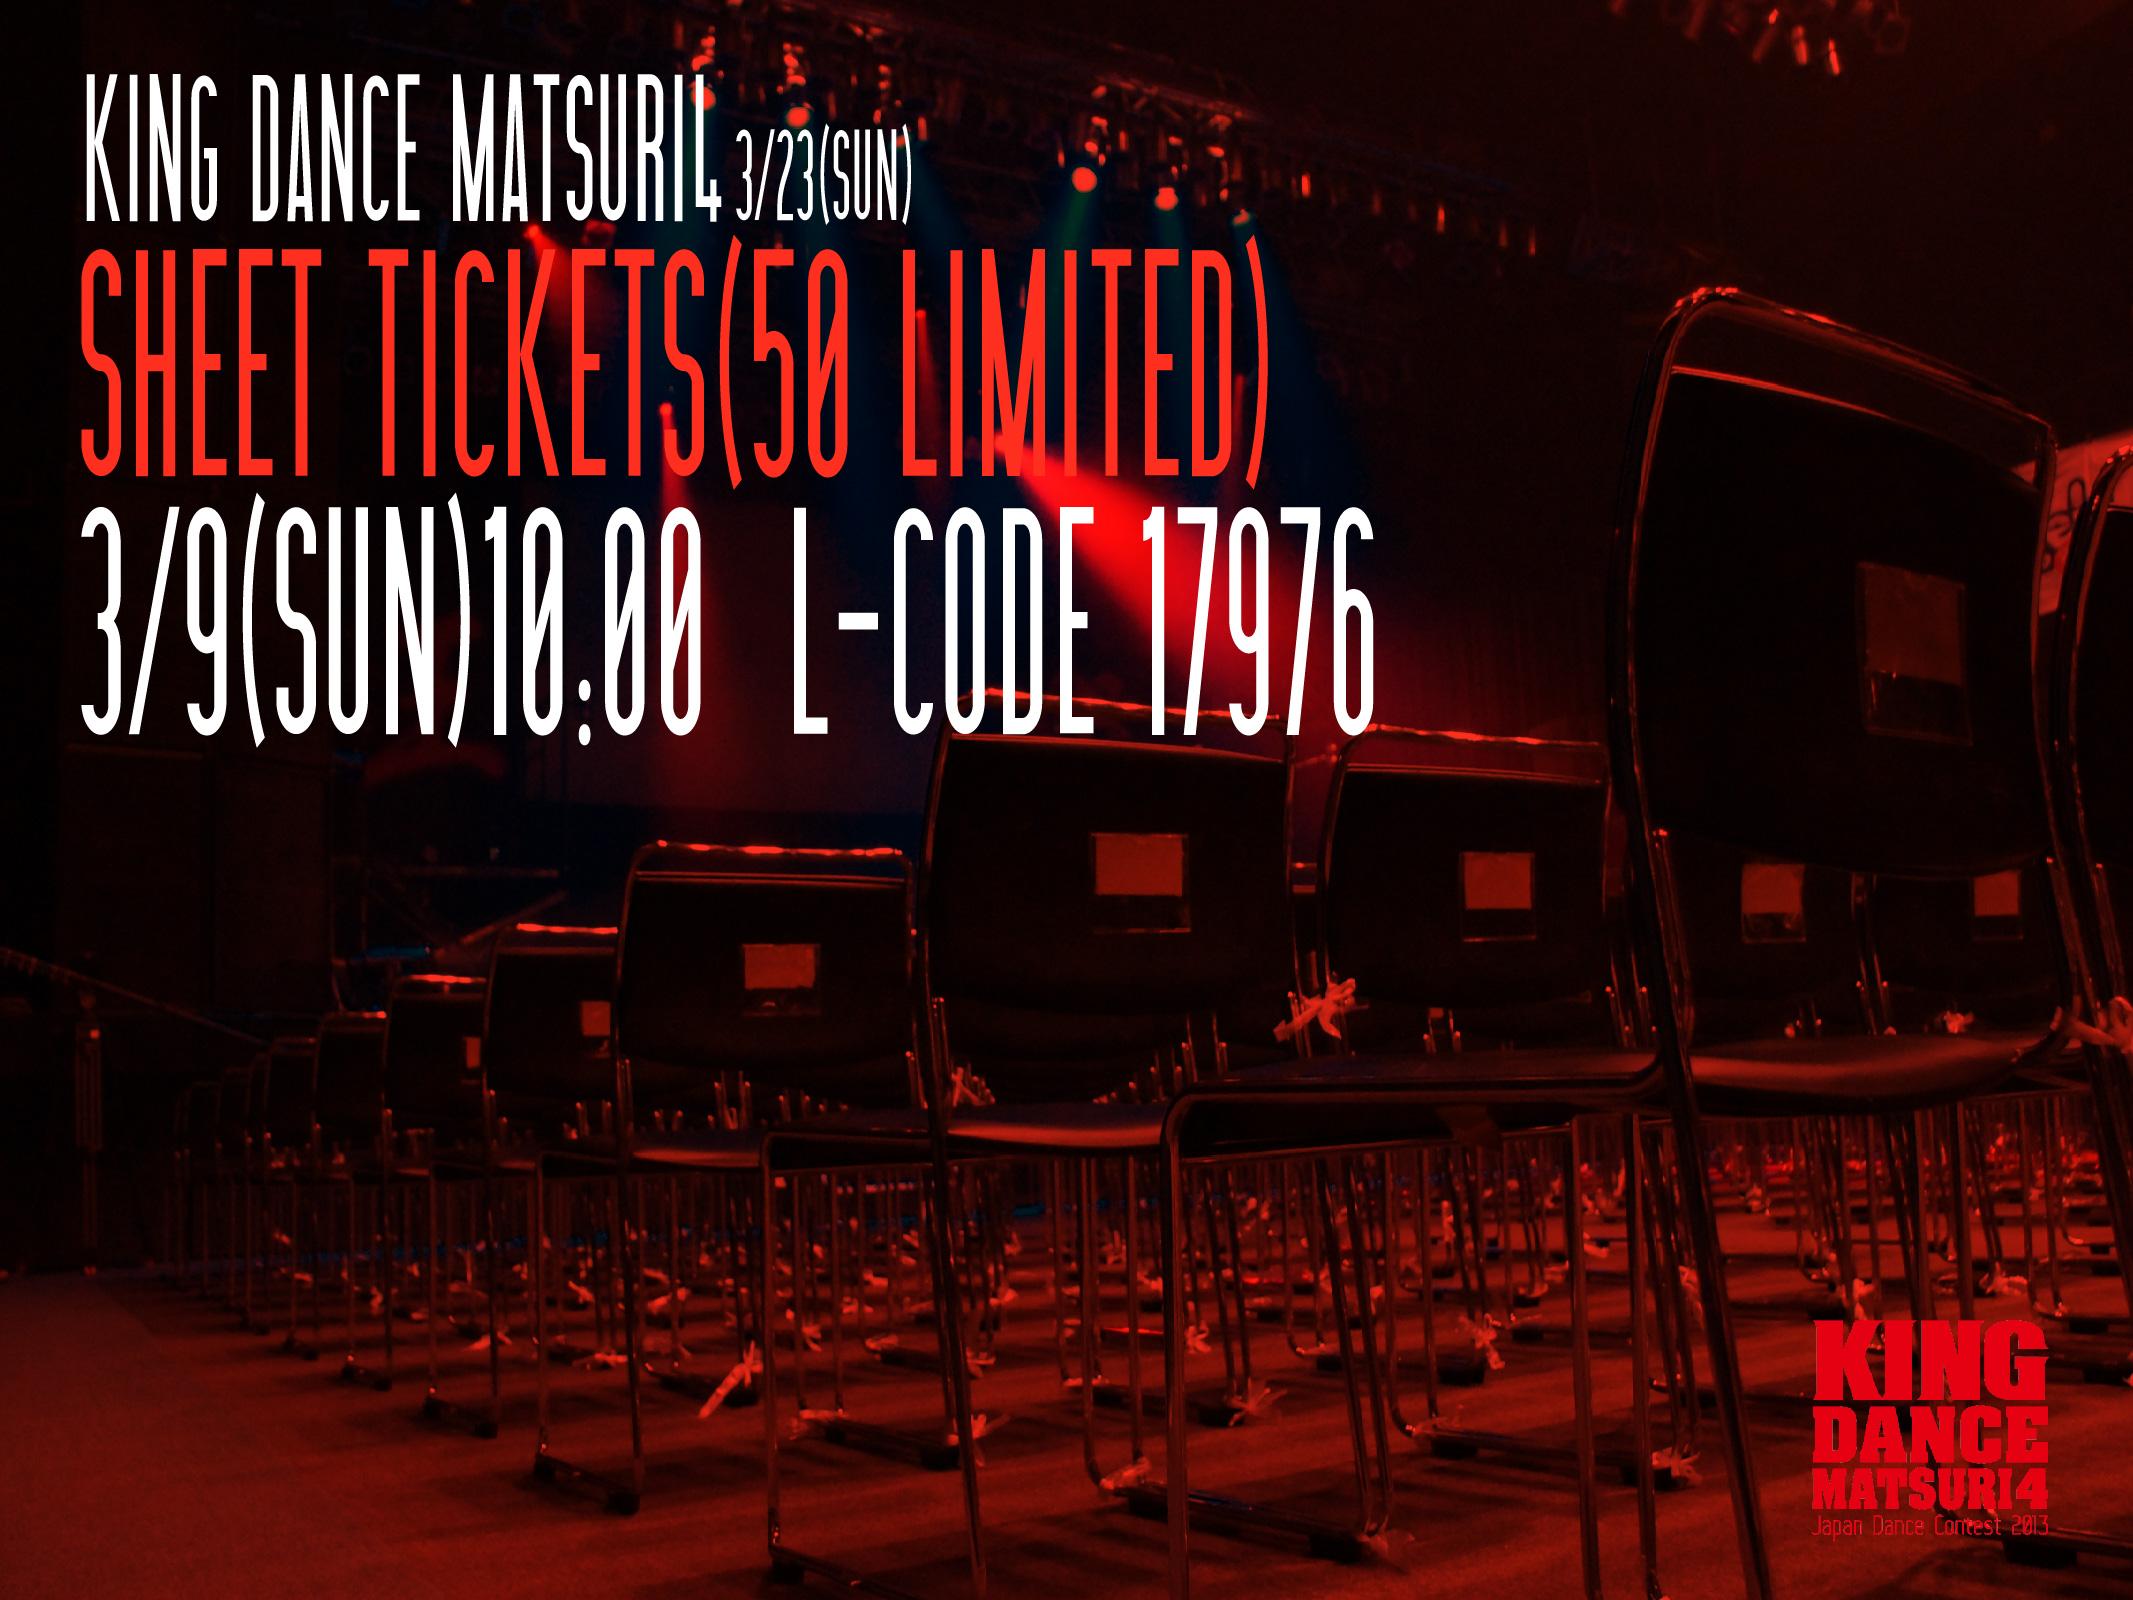 【KING DANCE MATSURI4イス席チケット追加販売のお知らせ。】